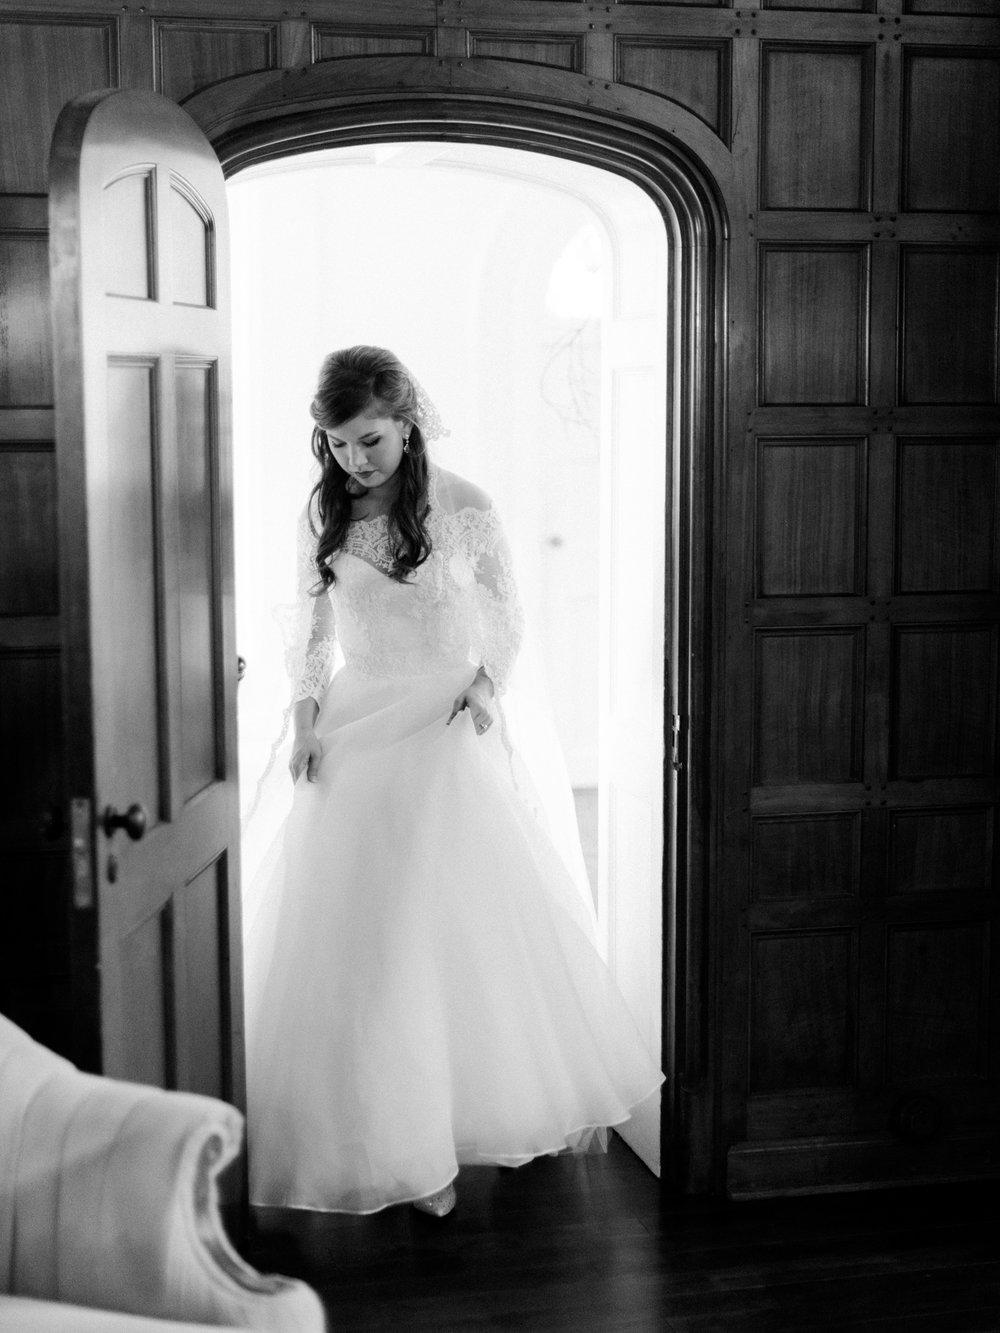 gassaway-mansion-greenville-south-carolina-luxury-film-wedding-photographer-13.jpg